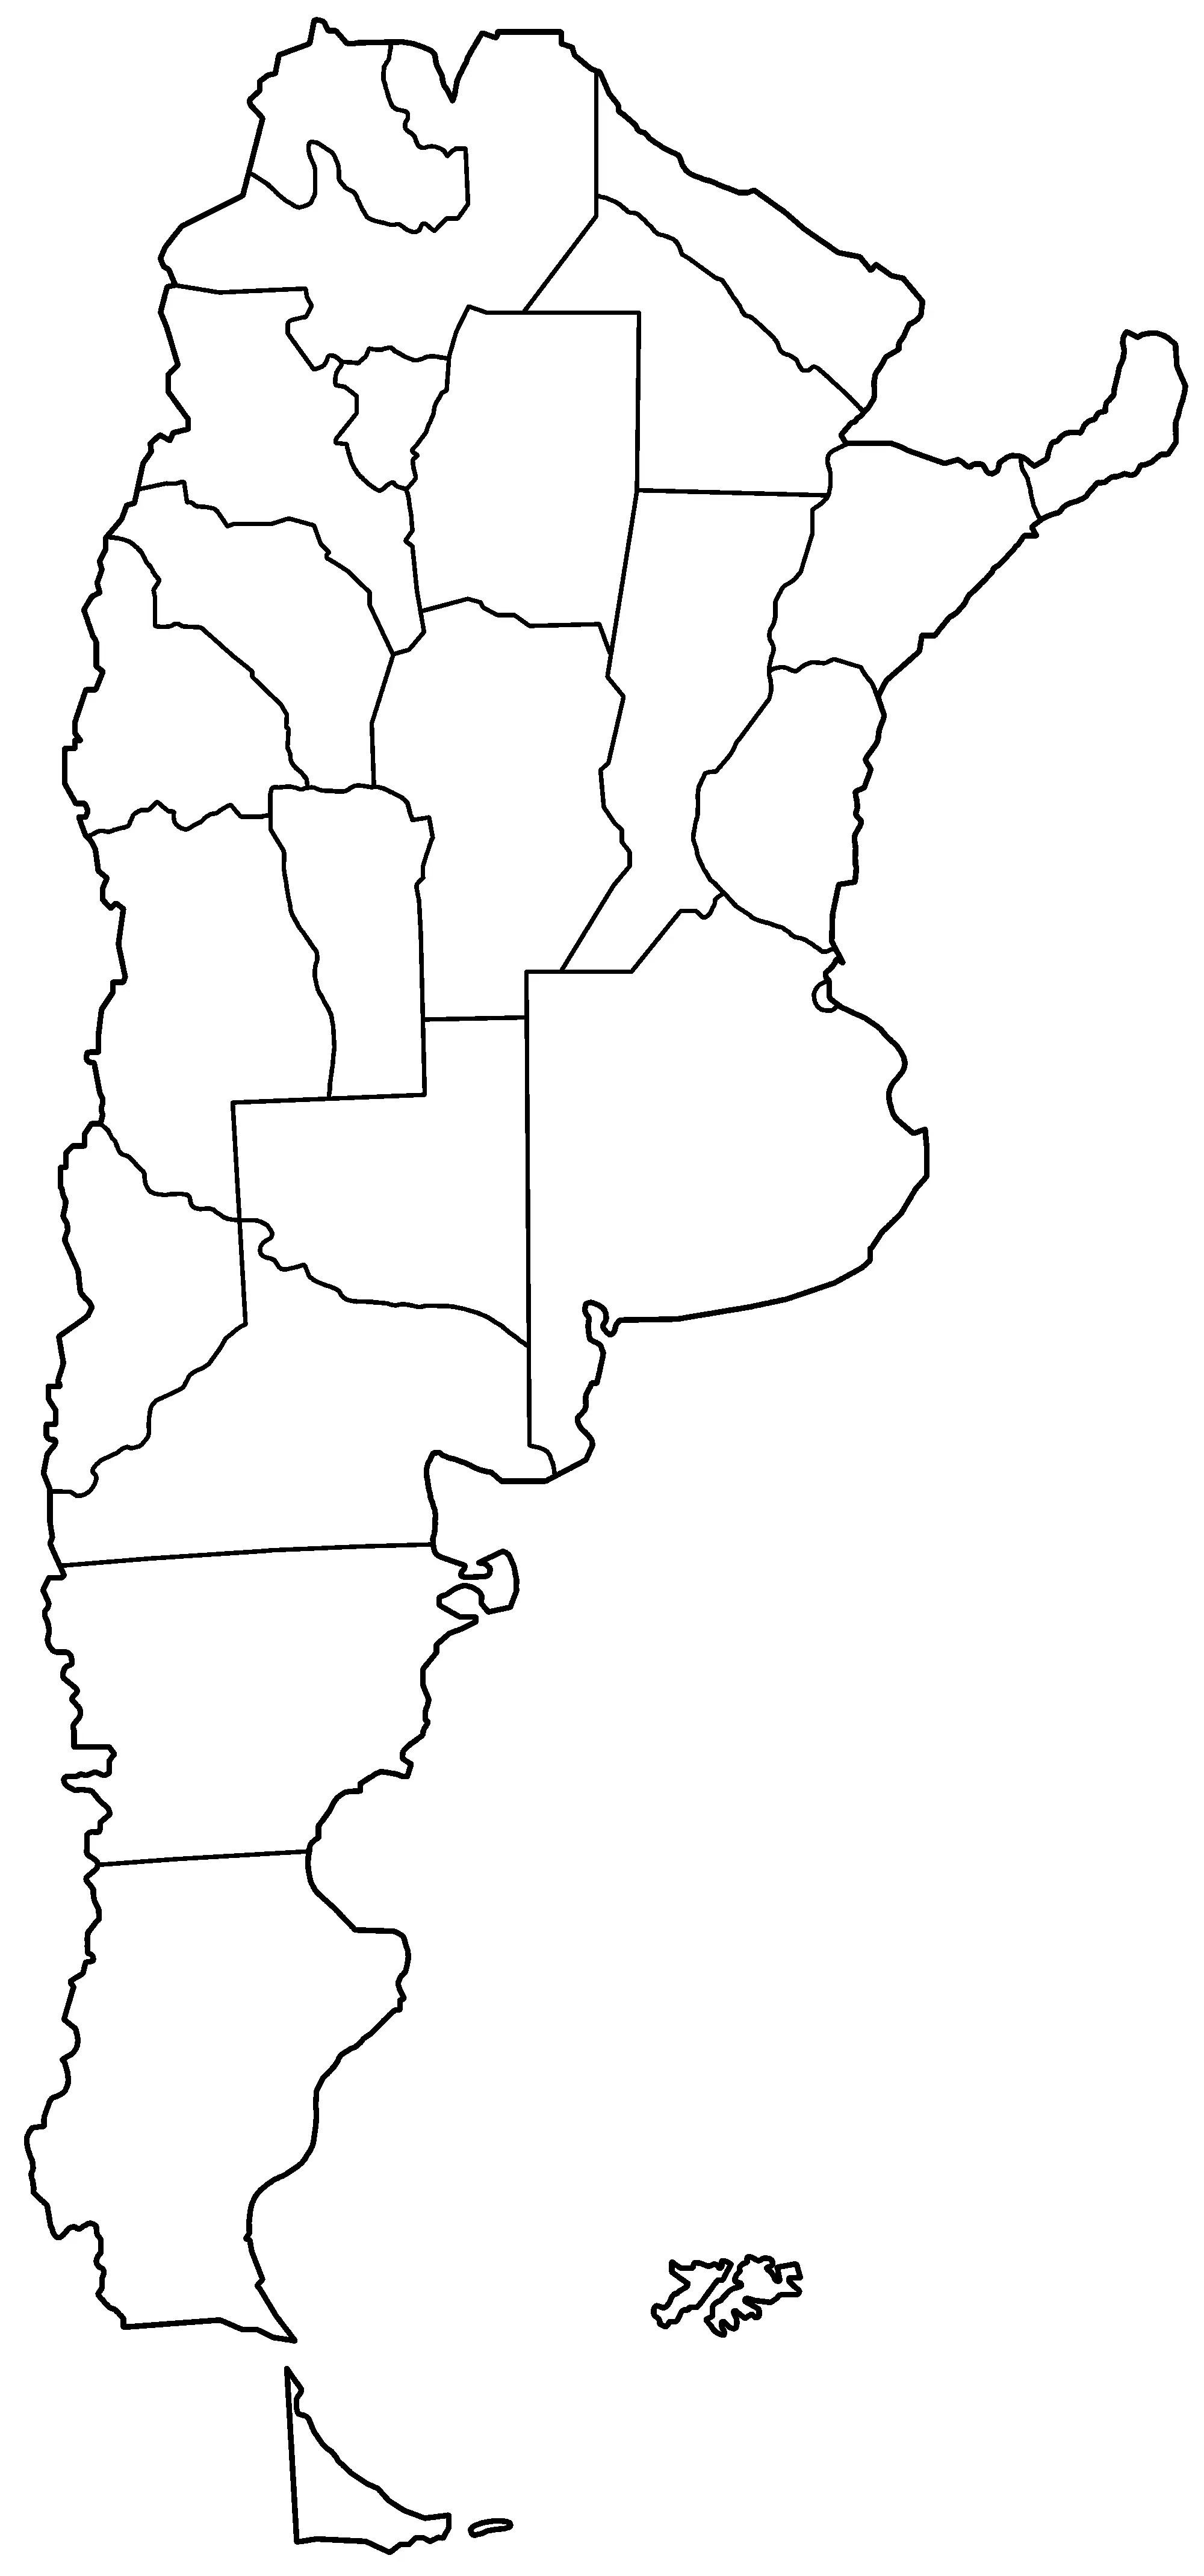 Argentina Provinces Blank Mapsof